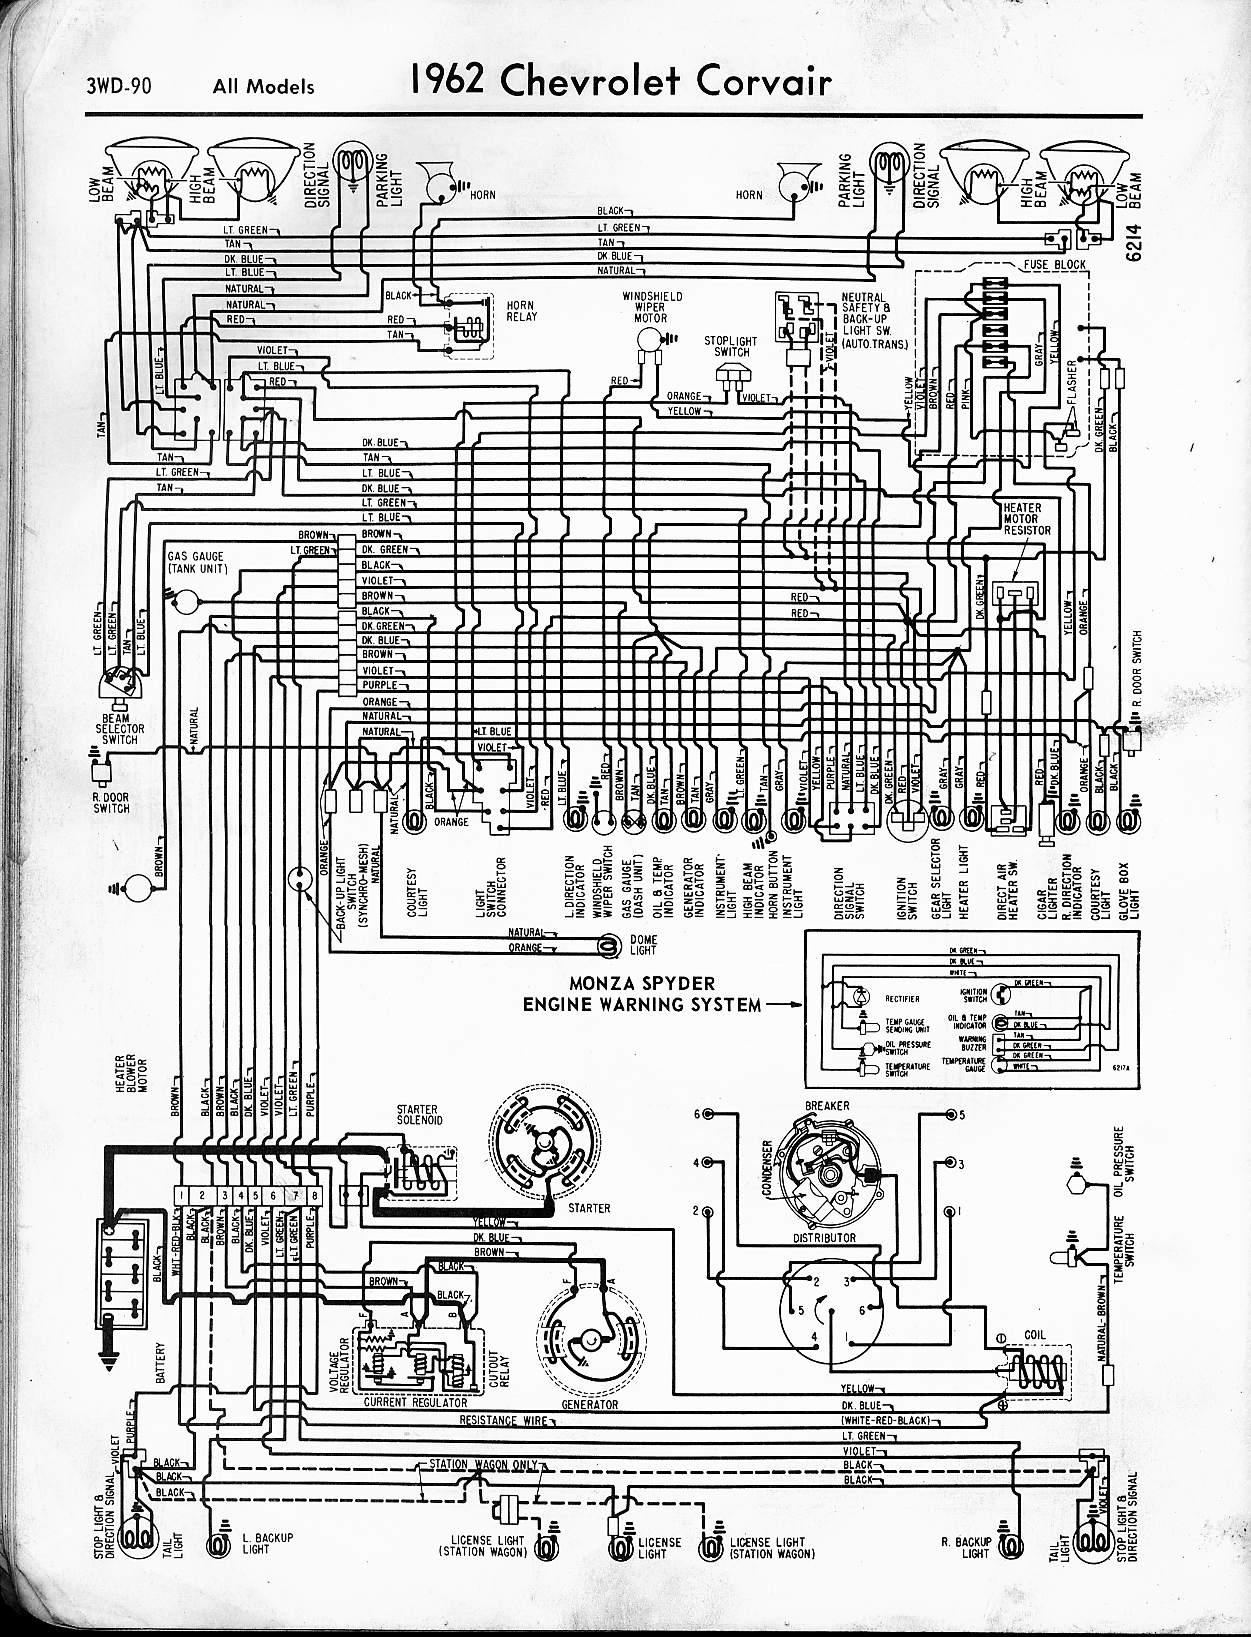 1965 corvair wiring diagram schematic